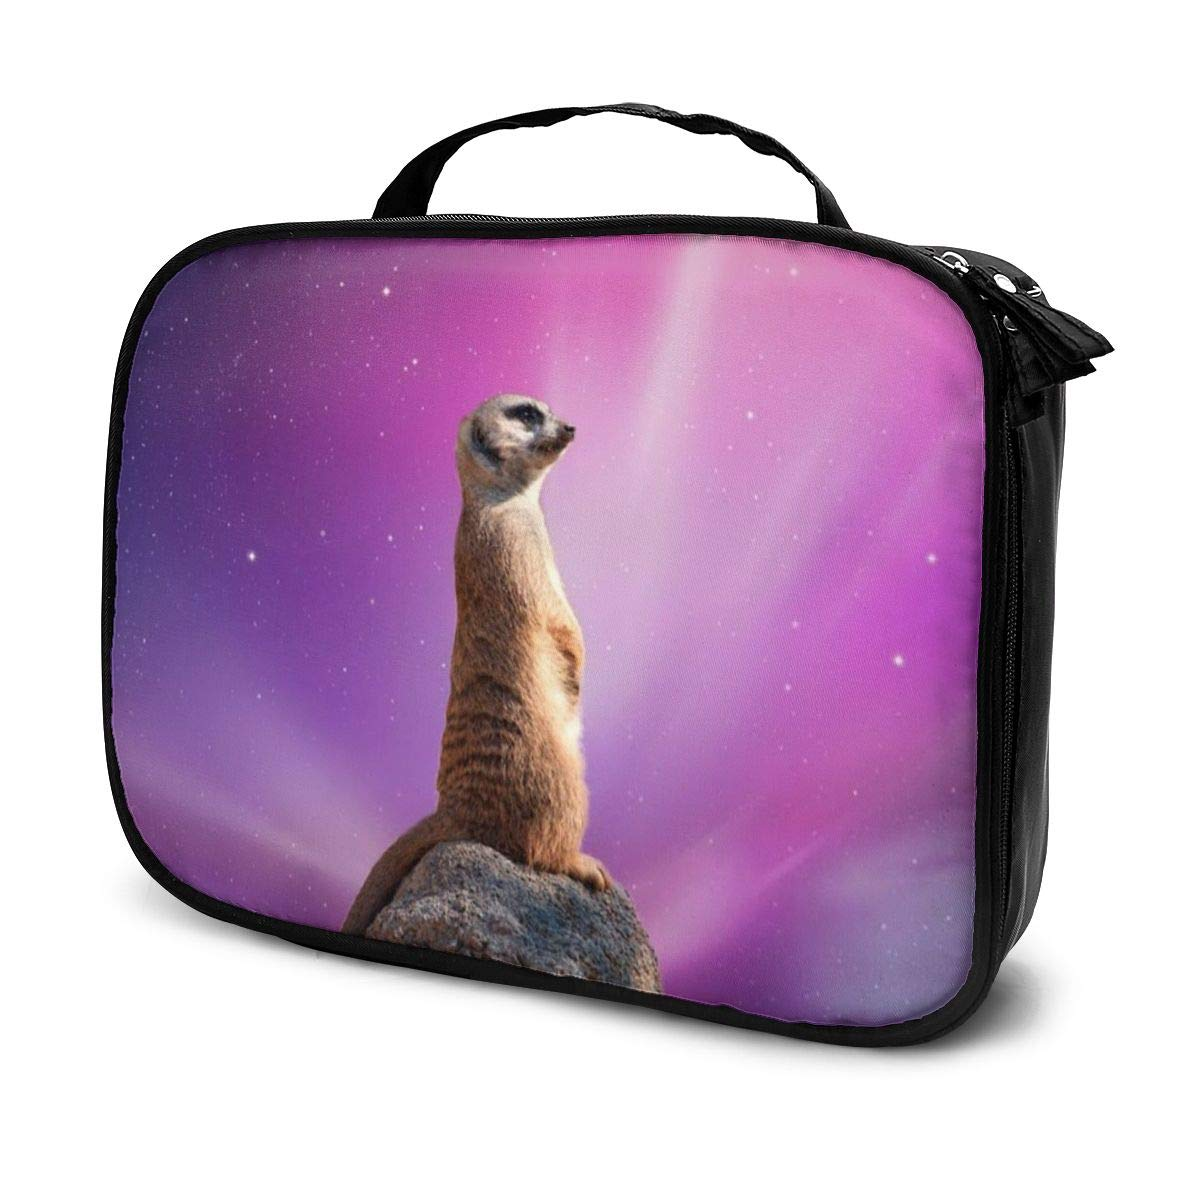 Meerkat Space (2) Canvas Makeup Bag Pouch Purse Handbag Organizer with Zipper